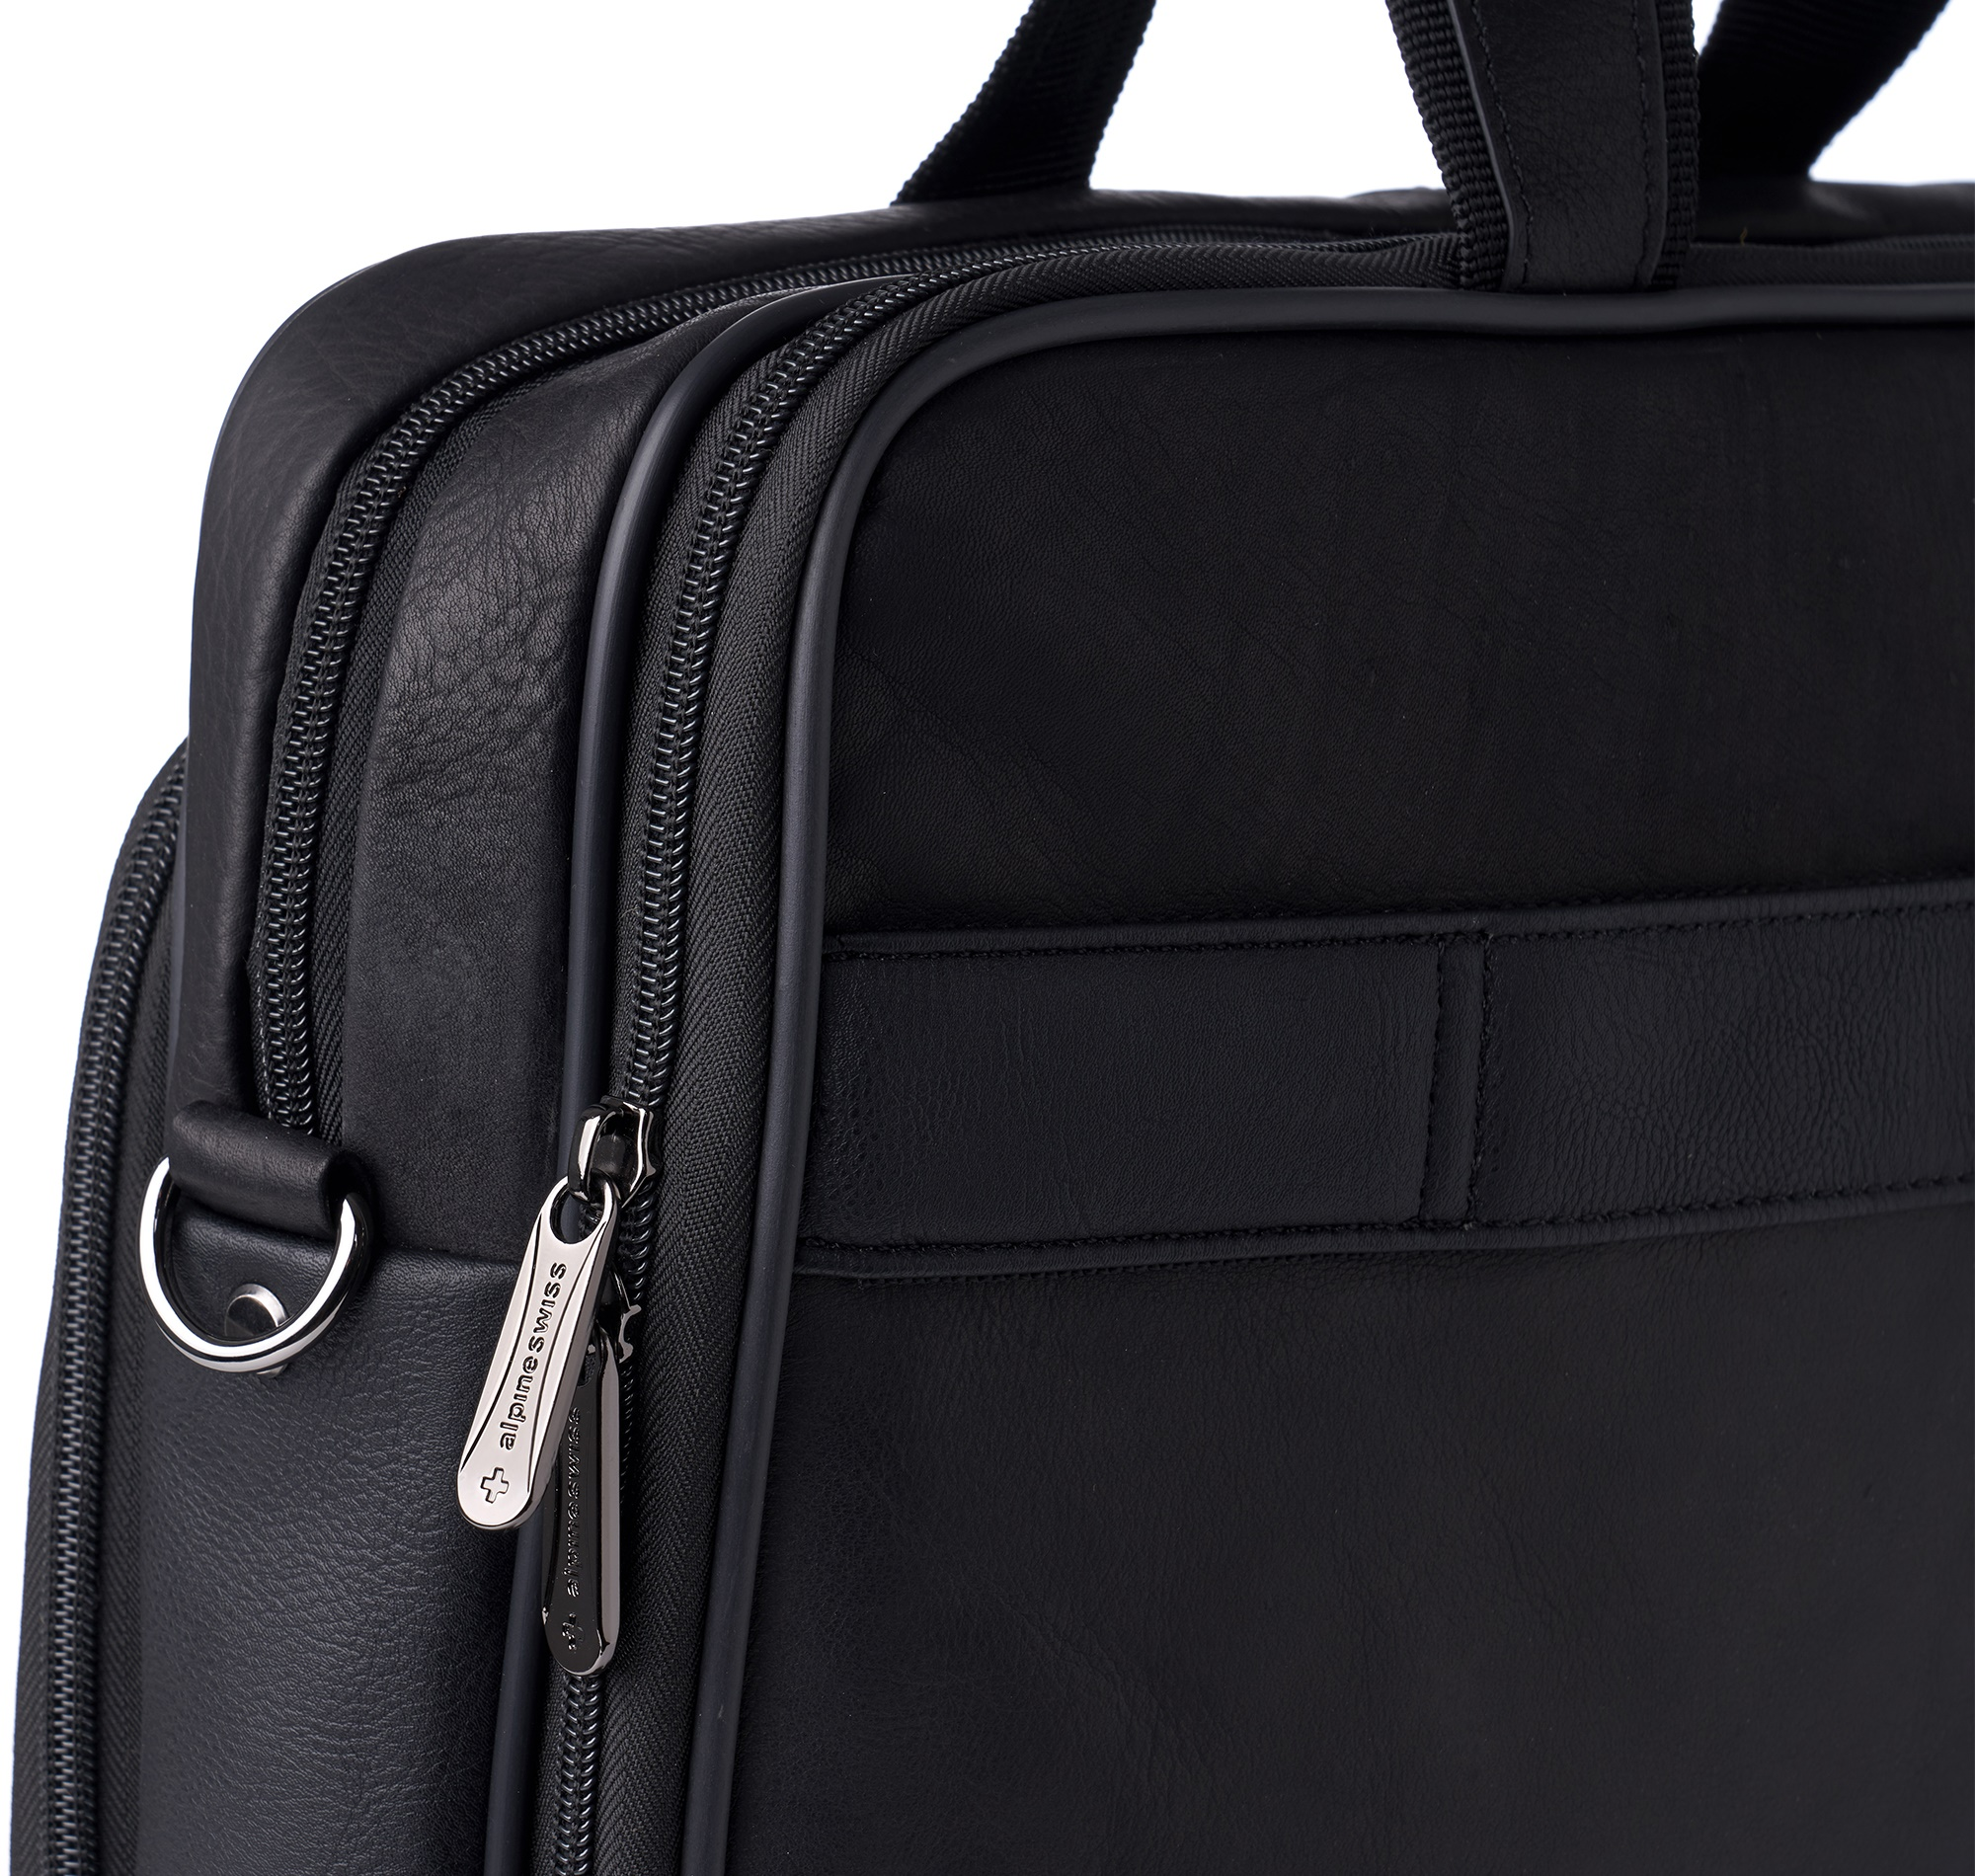 a7a166939 Alpine Swiss Messenger Bag Leather 15.6 Laptop Briefcase Portfolio ...